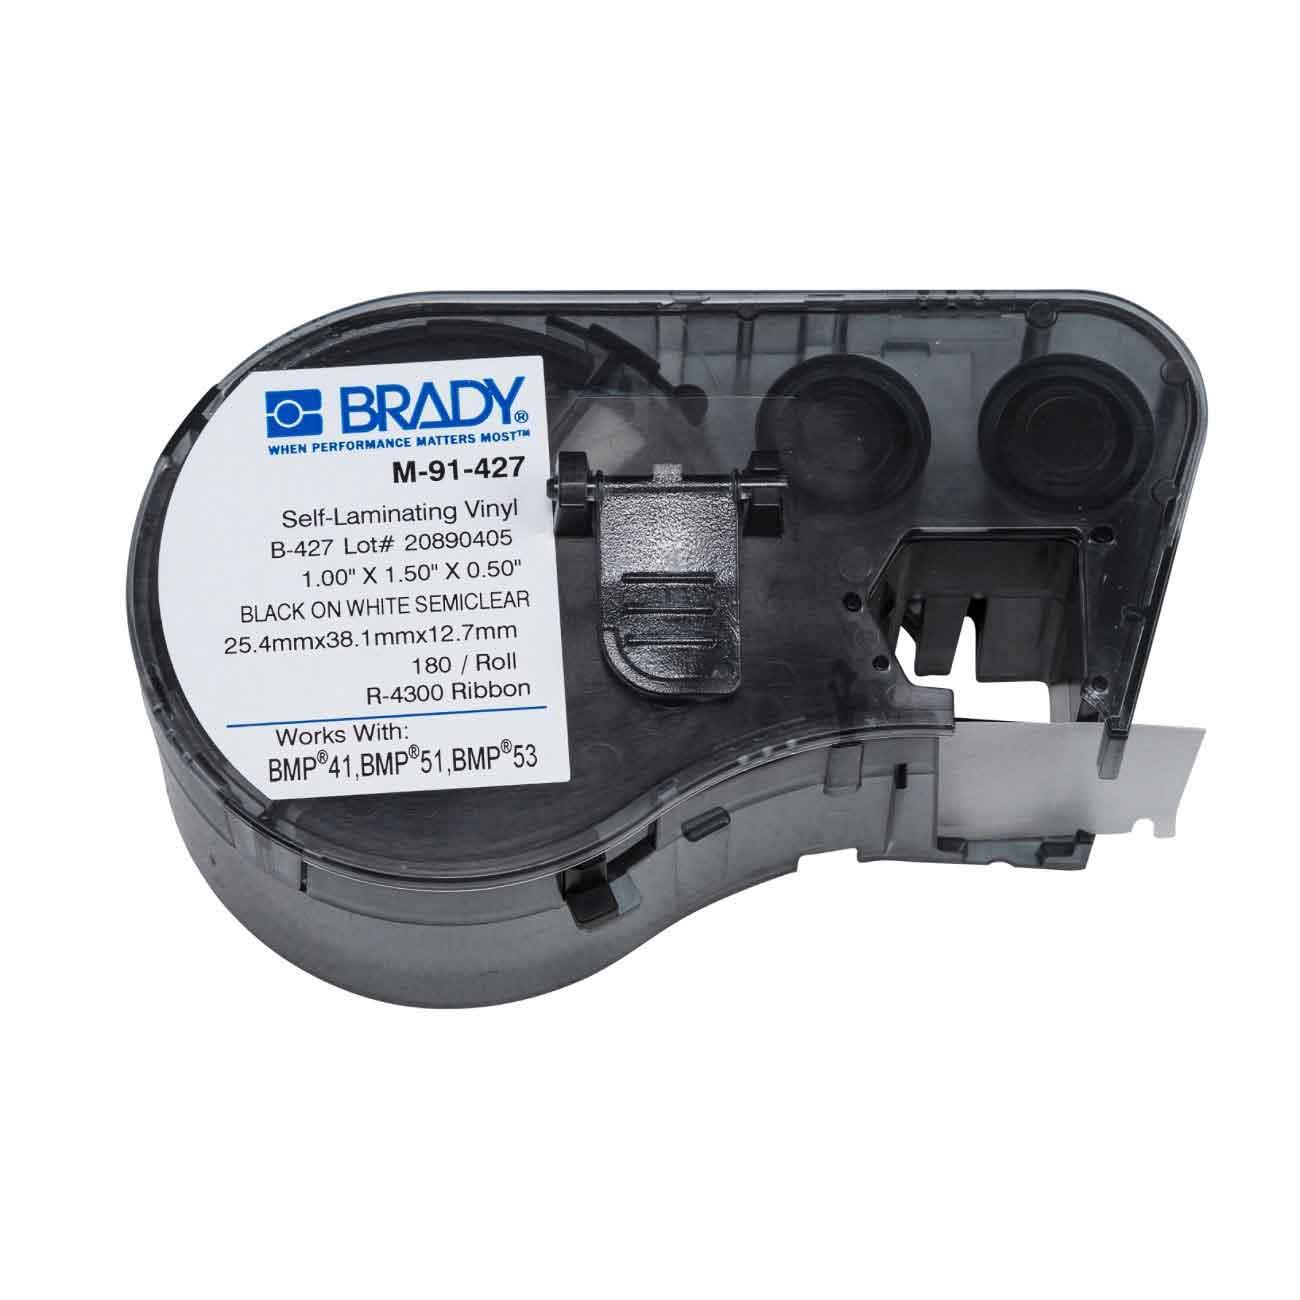 Thermal Transfer / Dot Matrix Printable Nylon Cloth Label for BMP51, Brady 240 Labels